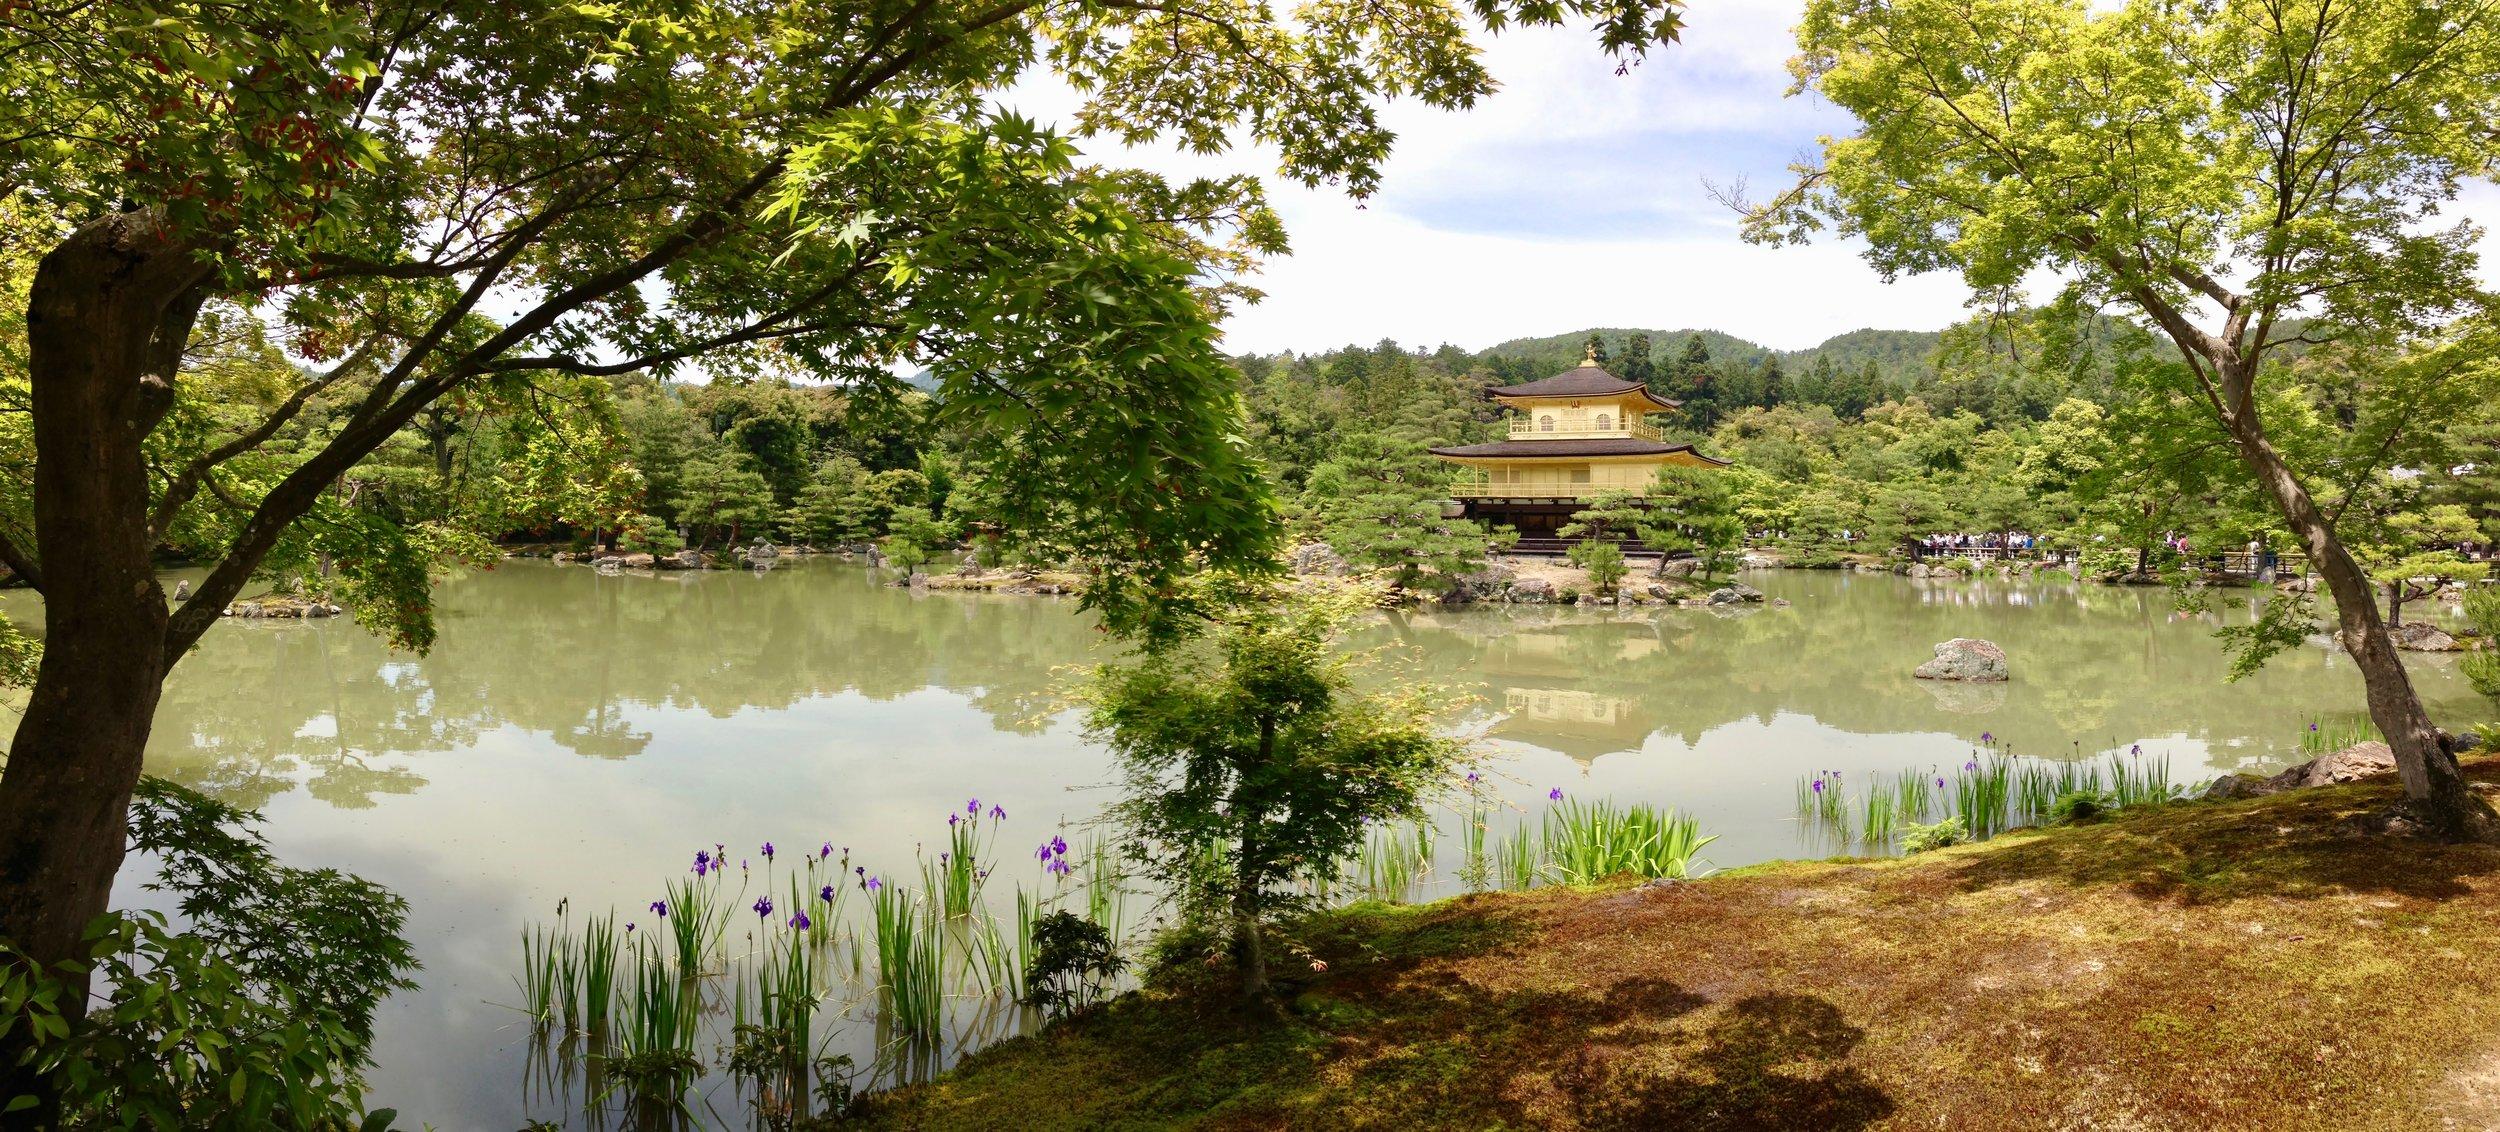 The Golden Pagoda, Kyoto, Japan